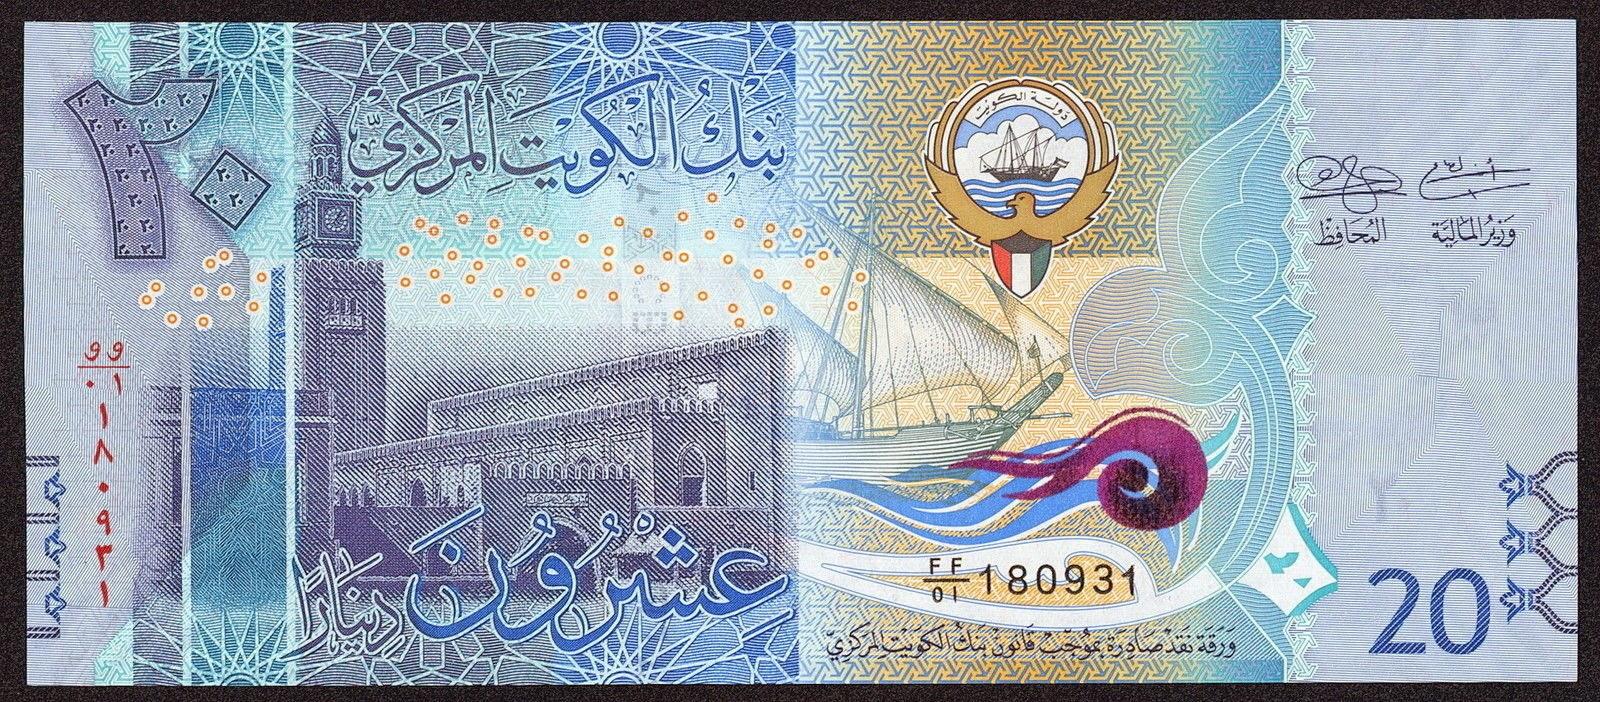 Kuwait New Banknotes 20 Dinars bank note 2014